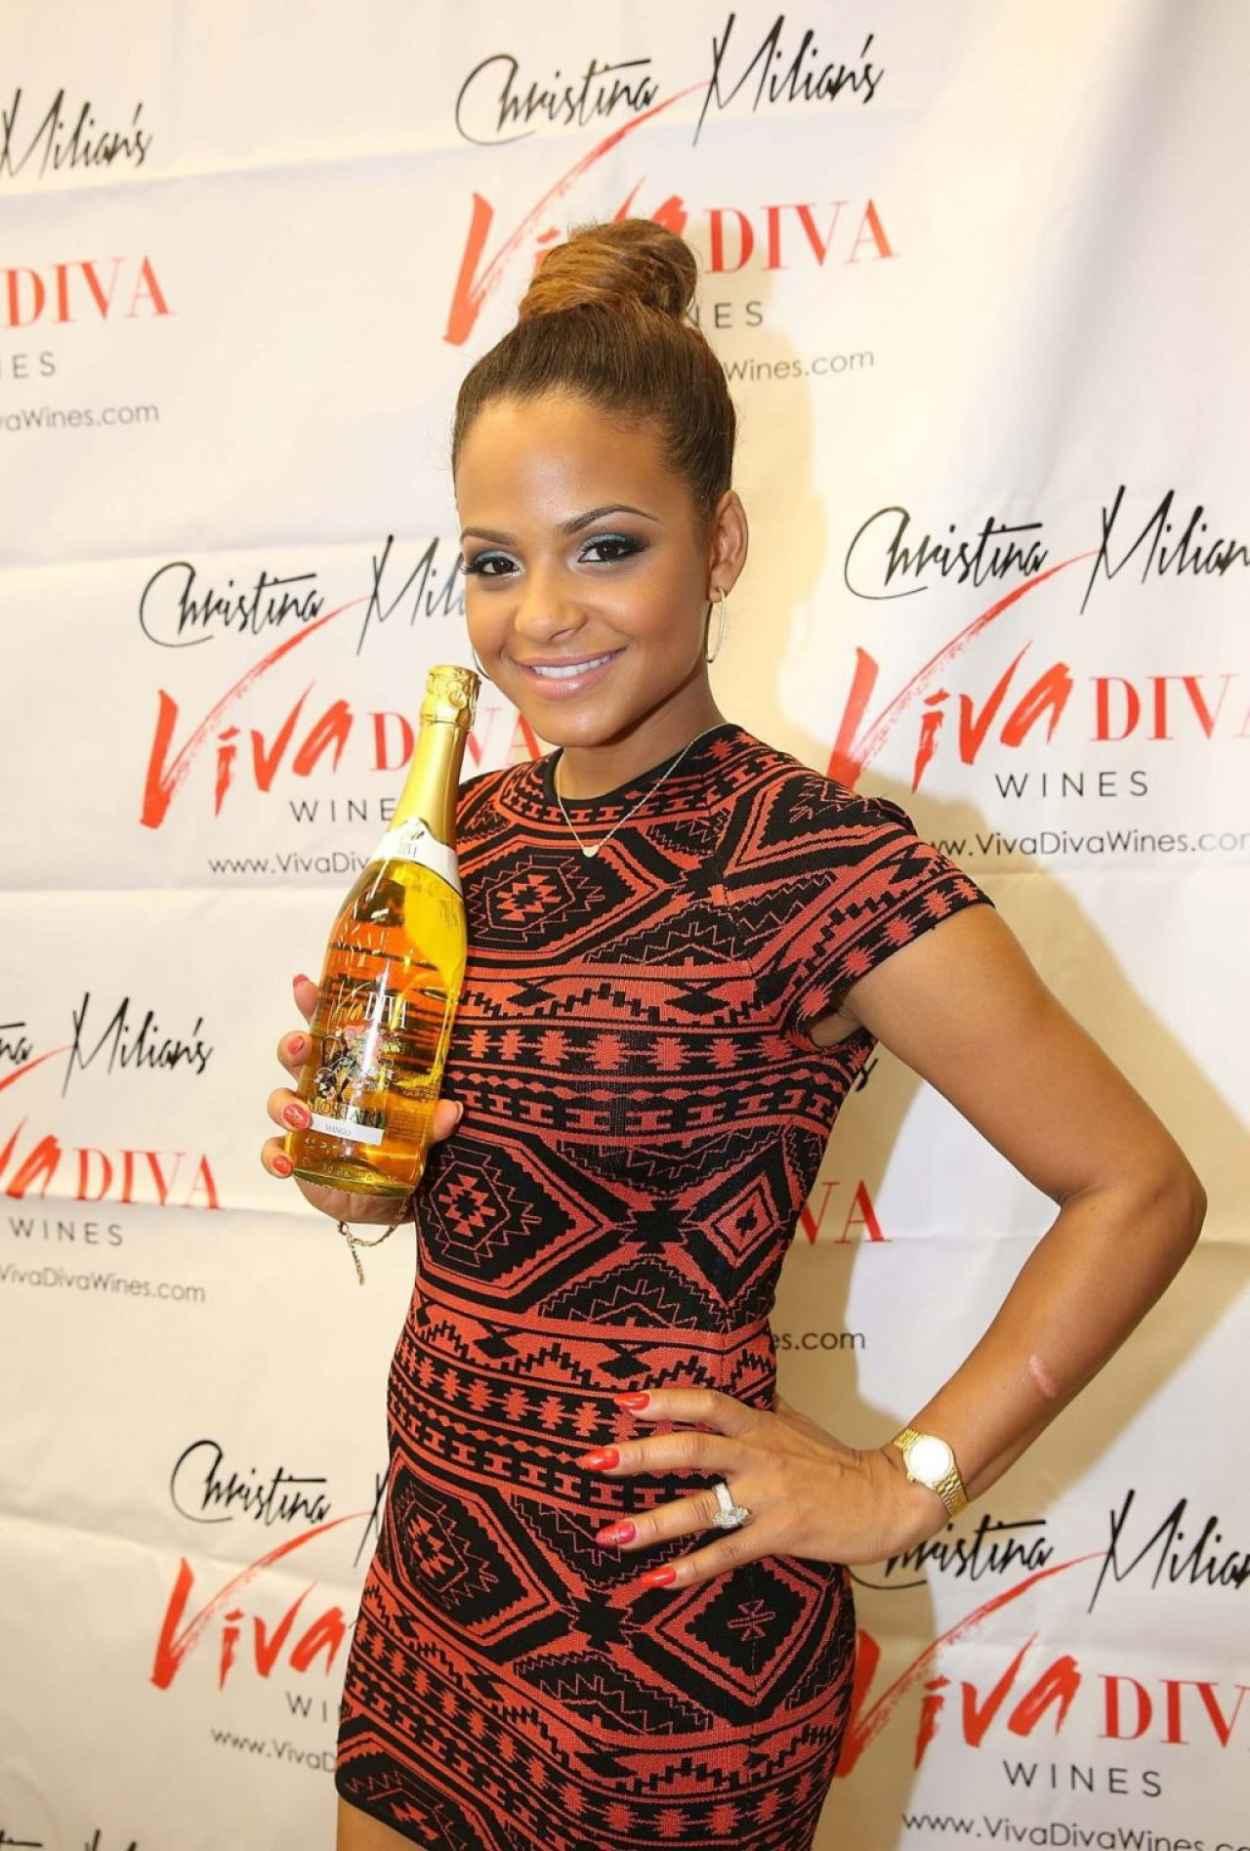 Christina Milian - Viva Diva Wine Signing - Miami December 2015-1